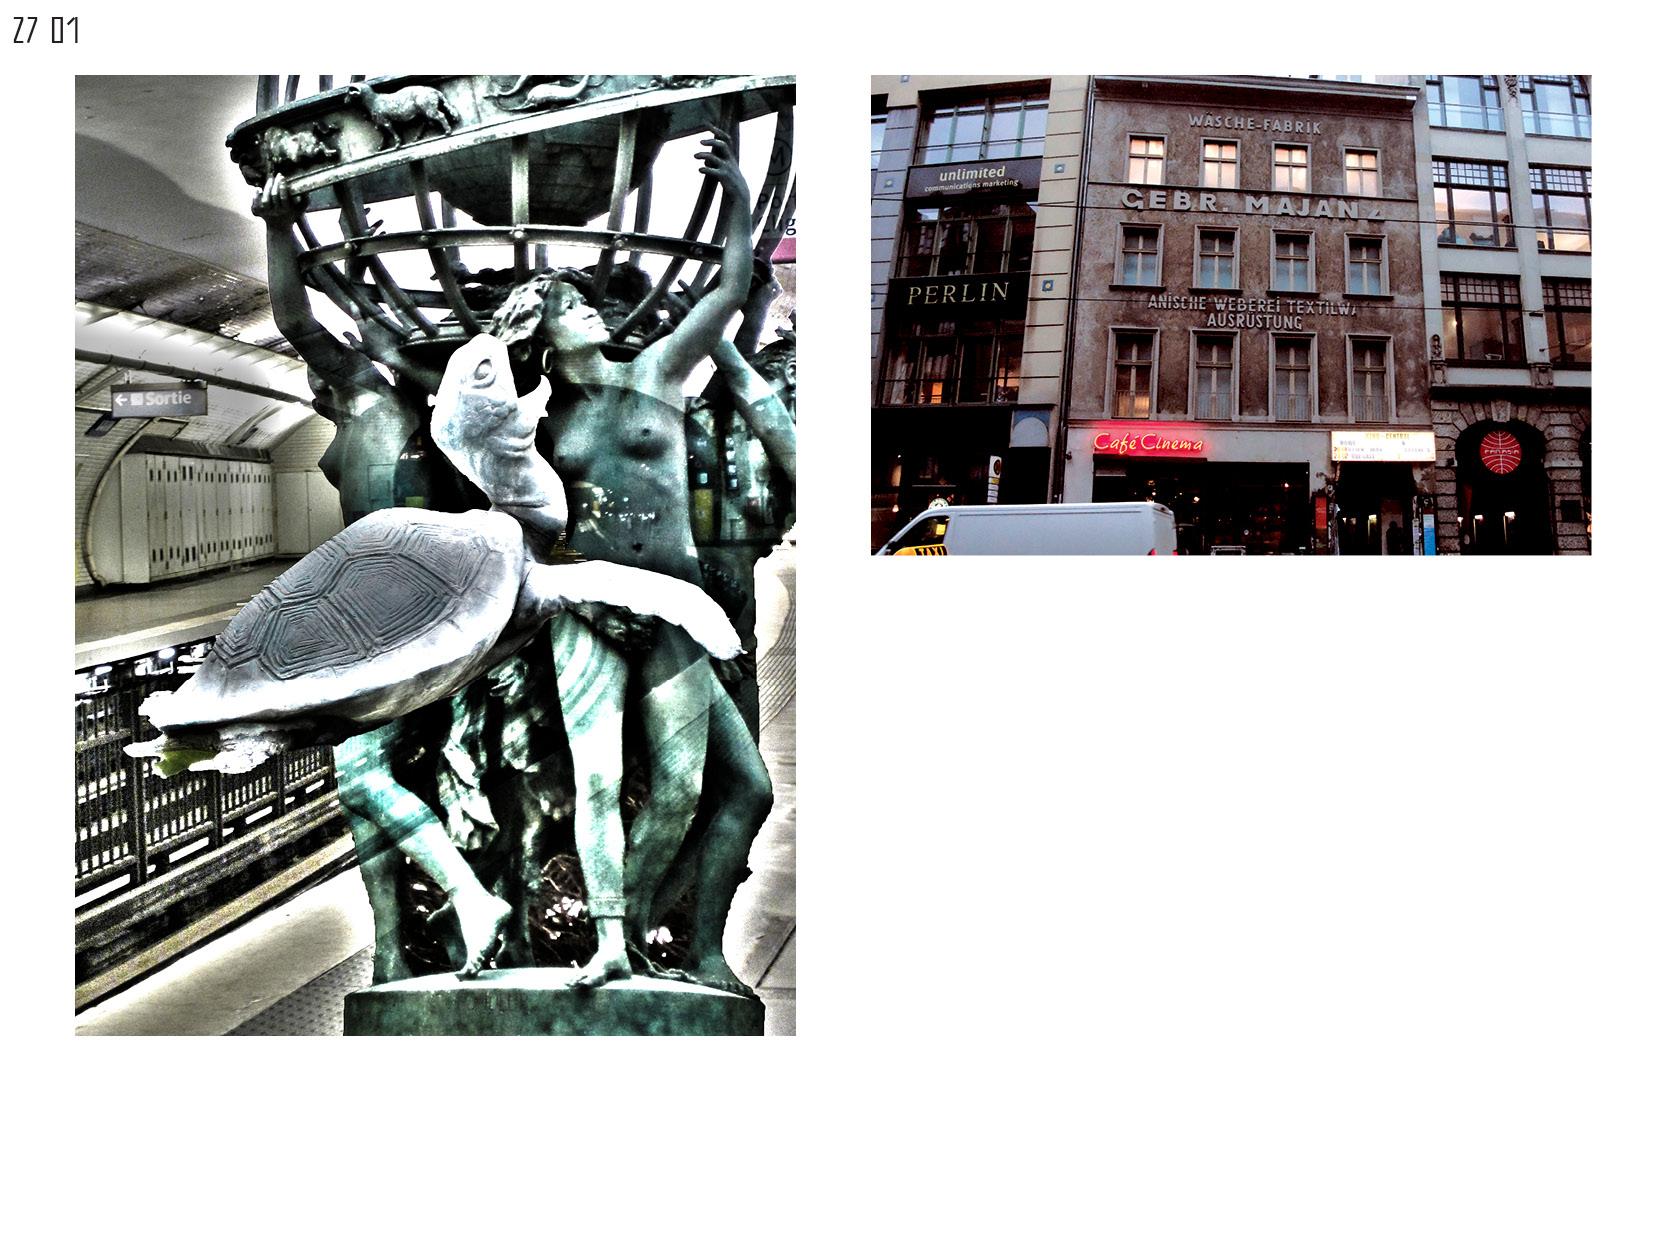 Gerrit-Schweiger-Dialog-Städte-Paris-Berlin-Jessica-Blank-Experiment-Fotoserie-Tagebuch-visuelle-Kommunikation-88